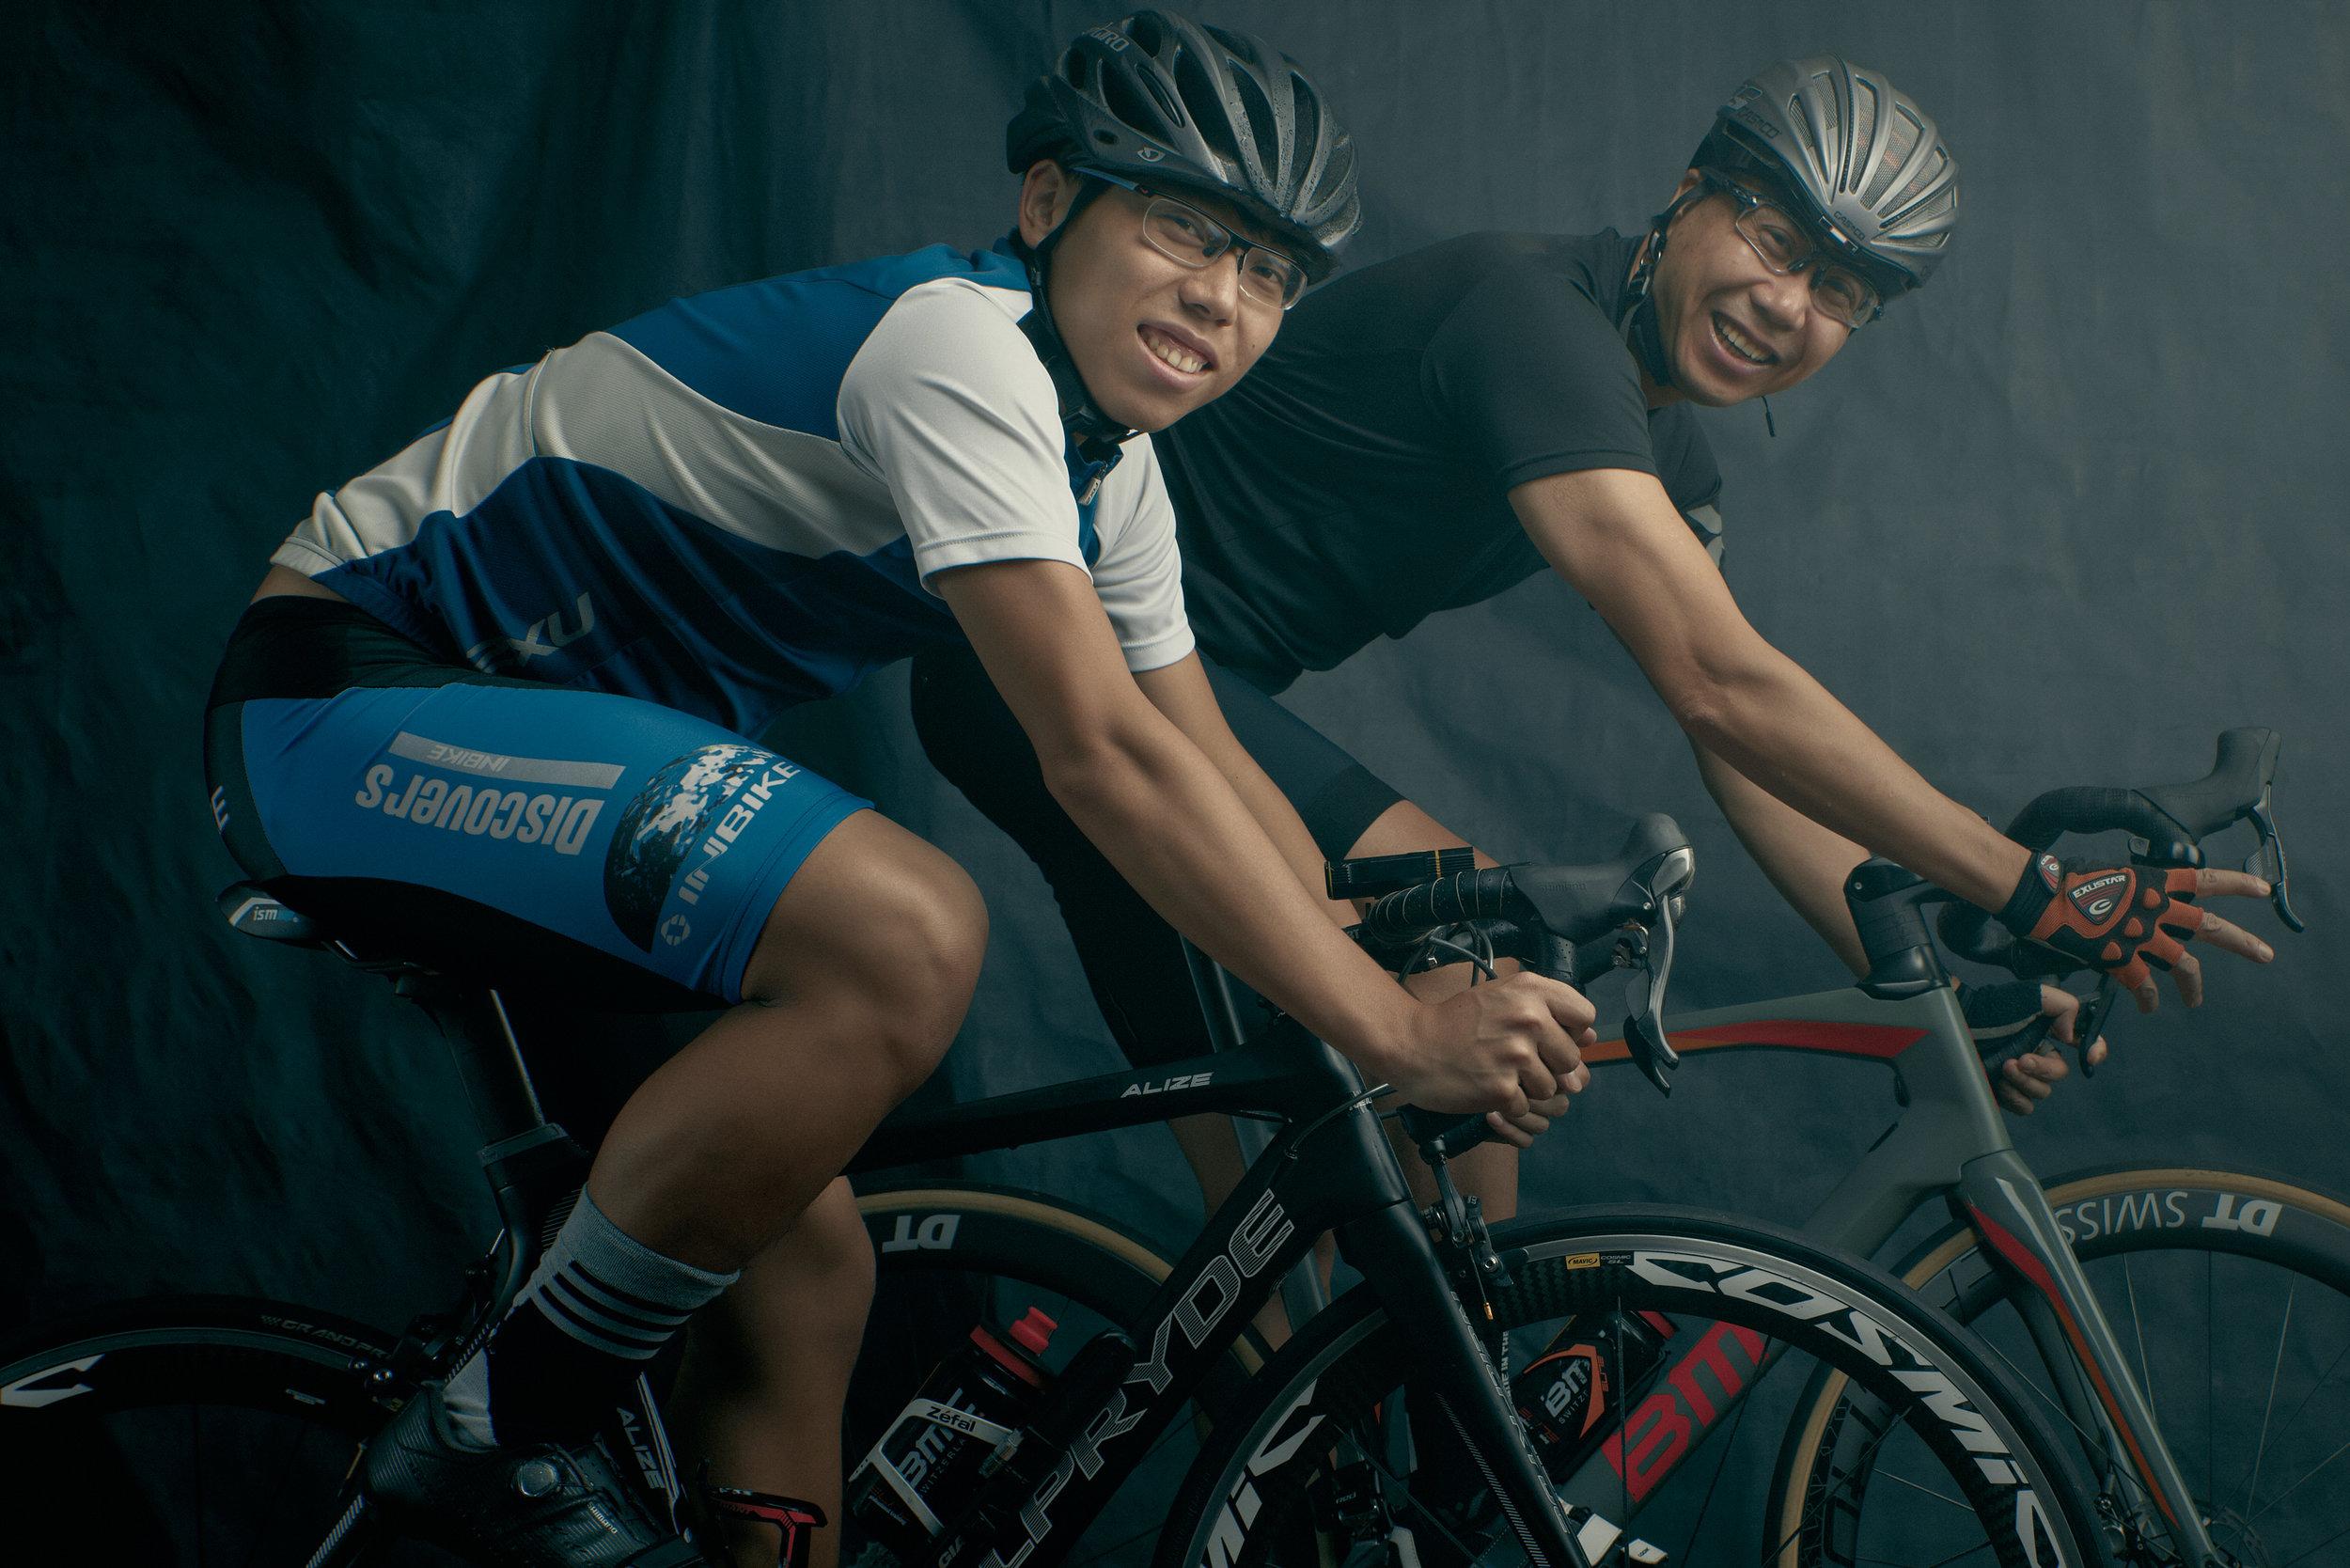 Cycling Bonding, Ricci Hall Sitting Room, 29th Sep 2018